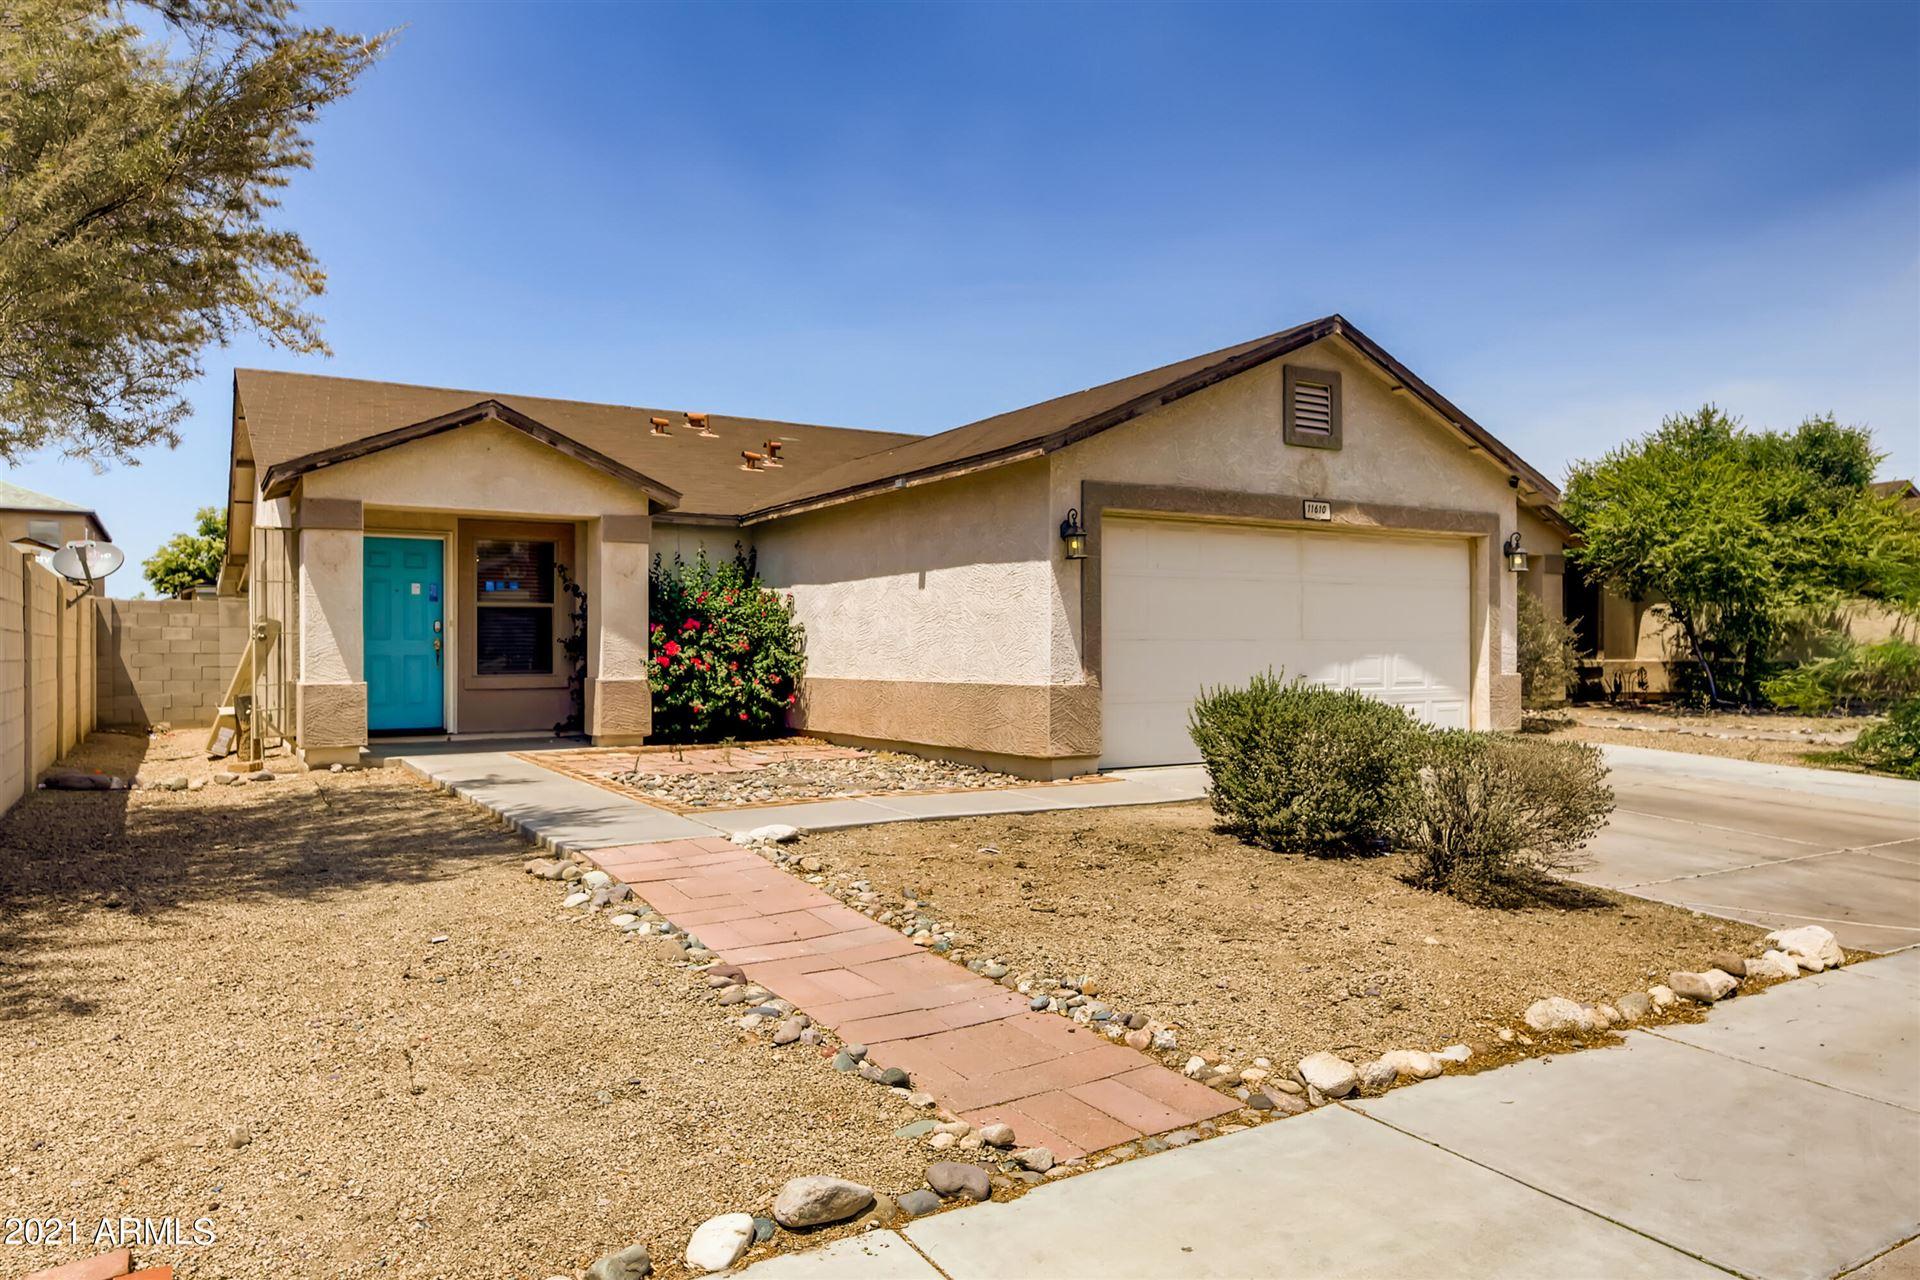 Photo of 11610 W WETHERSFIELD Road, El Mirage, AZ 85335 (MLS # 6249726)